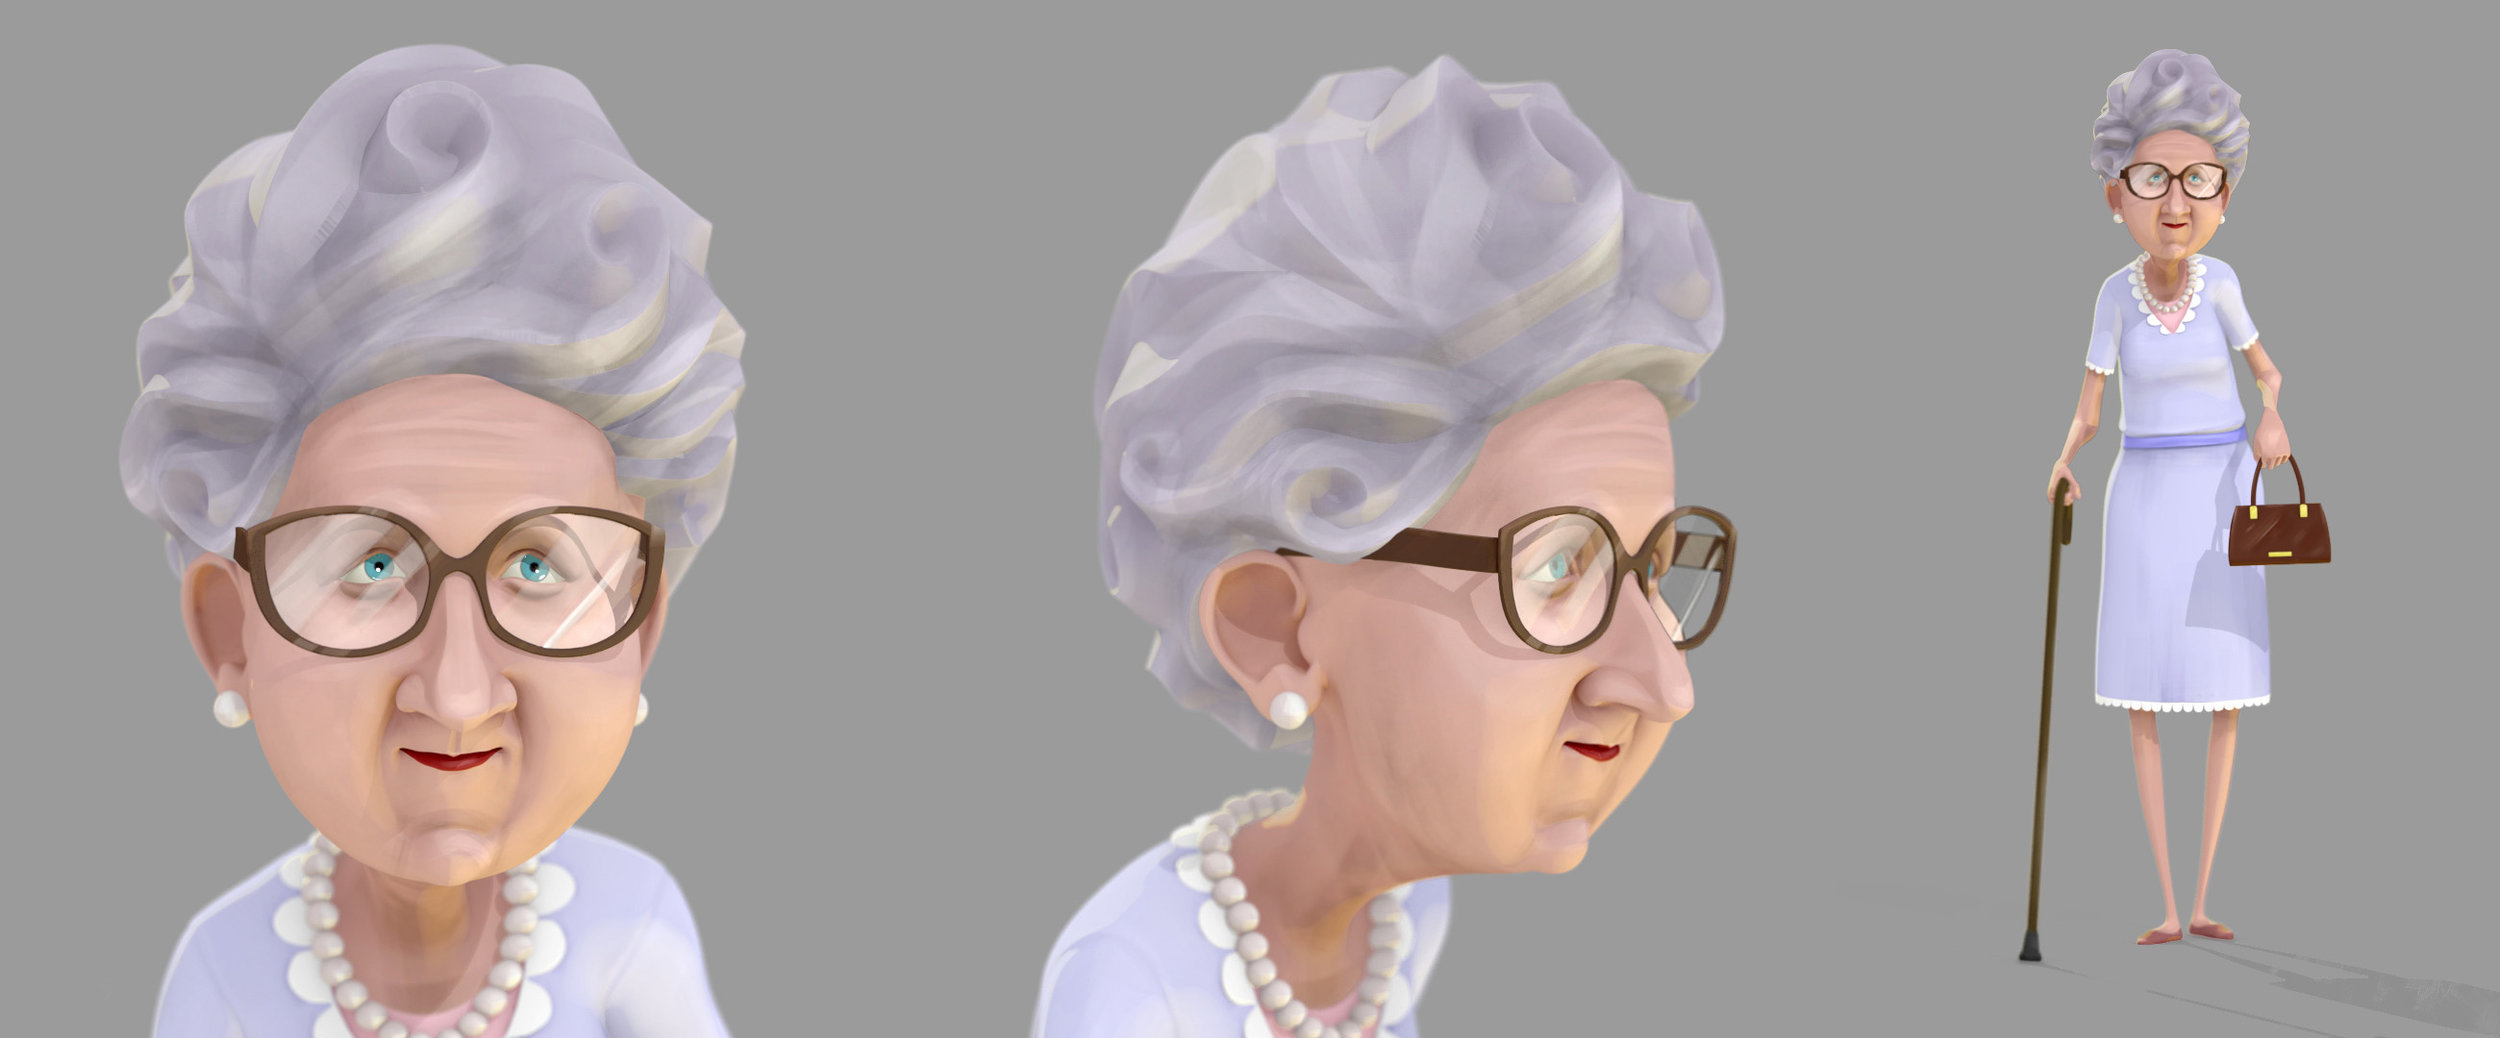 Grandma_3_views.jpg